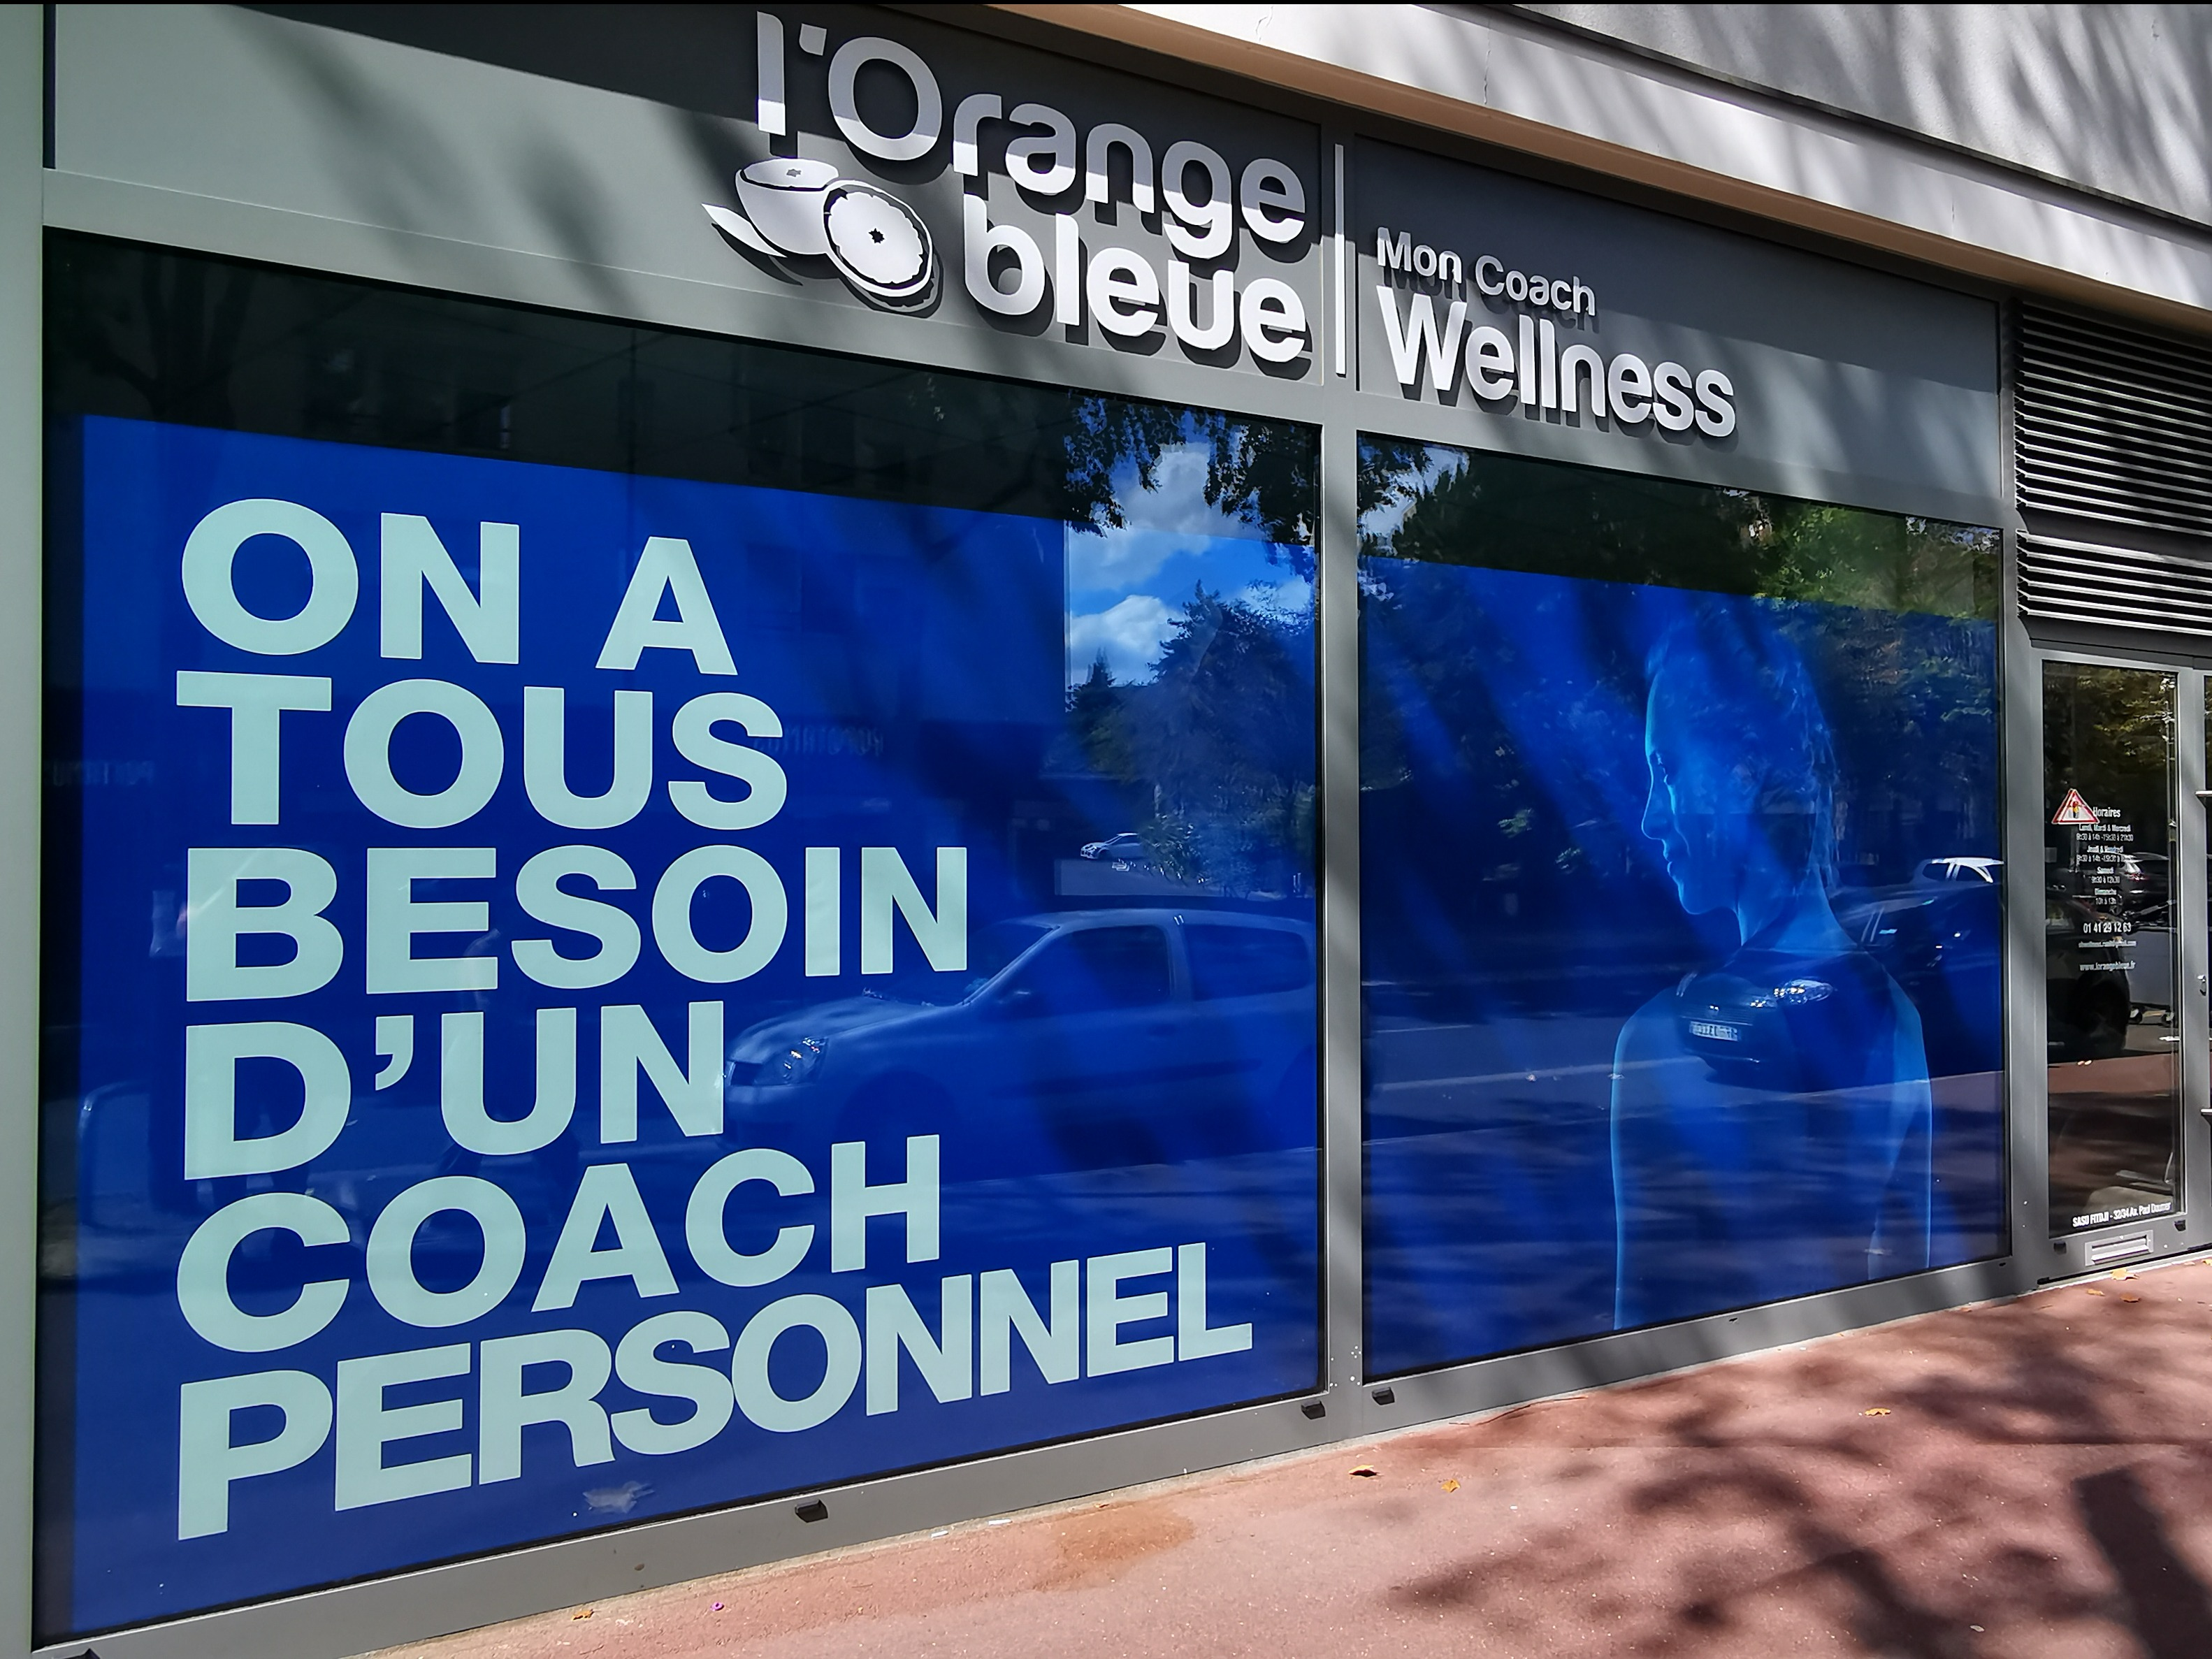 L'Orange Bleue Wellness Rueil-Malmaison